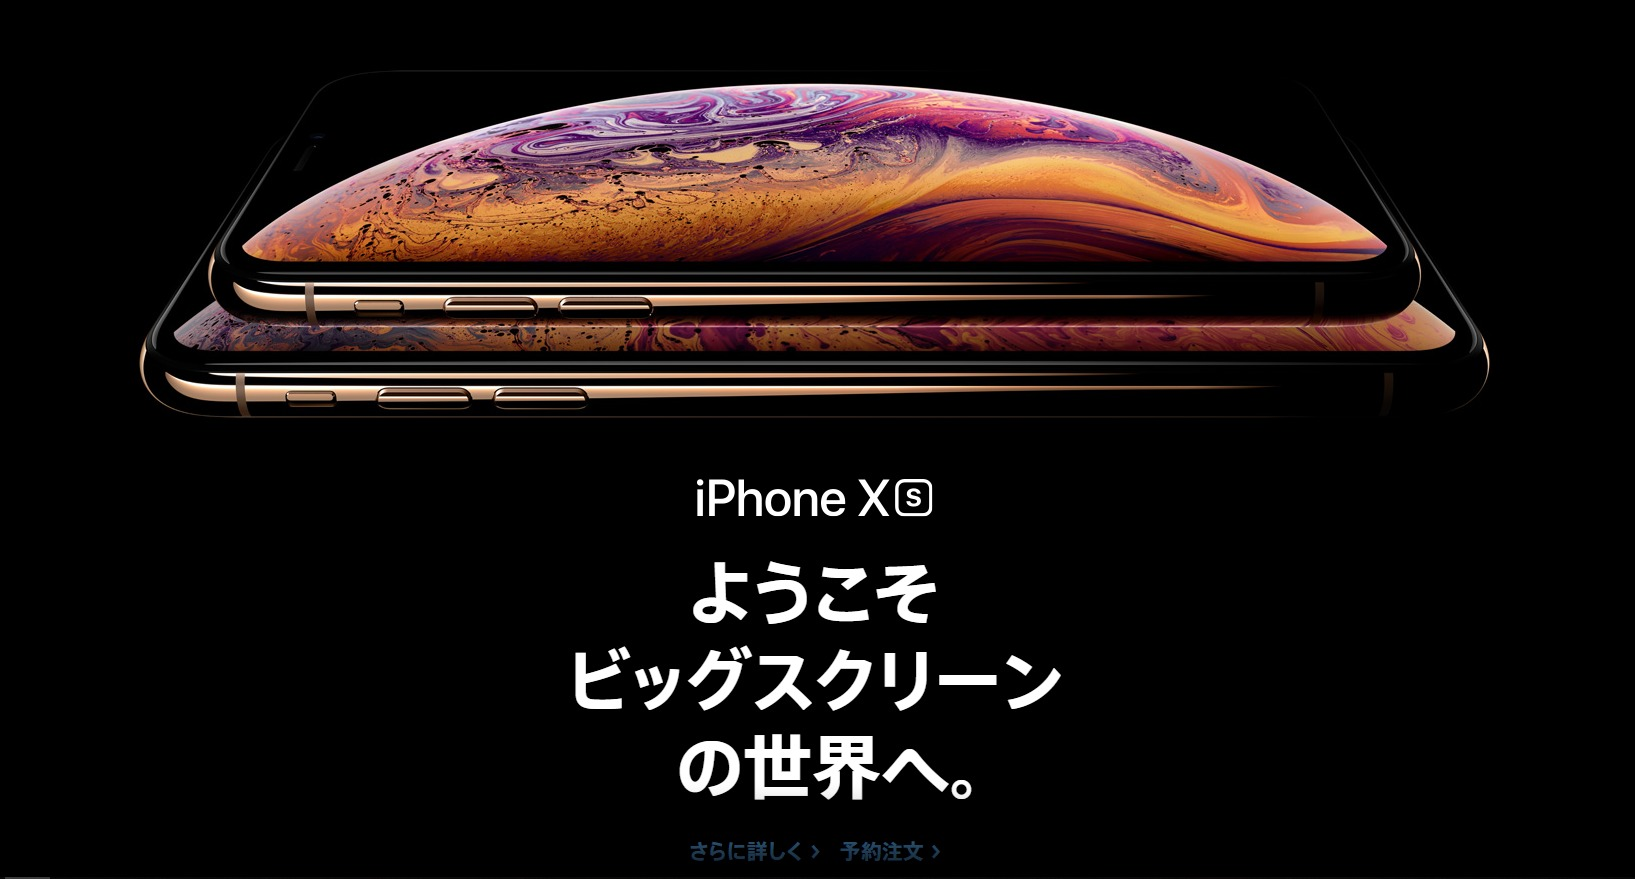 apple1 - 【ガジェット/スマホ】2018年9月発表!iPhone XS / XS Max / XR、Apple Watch 4の発表レポート